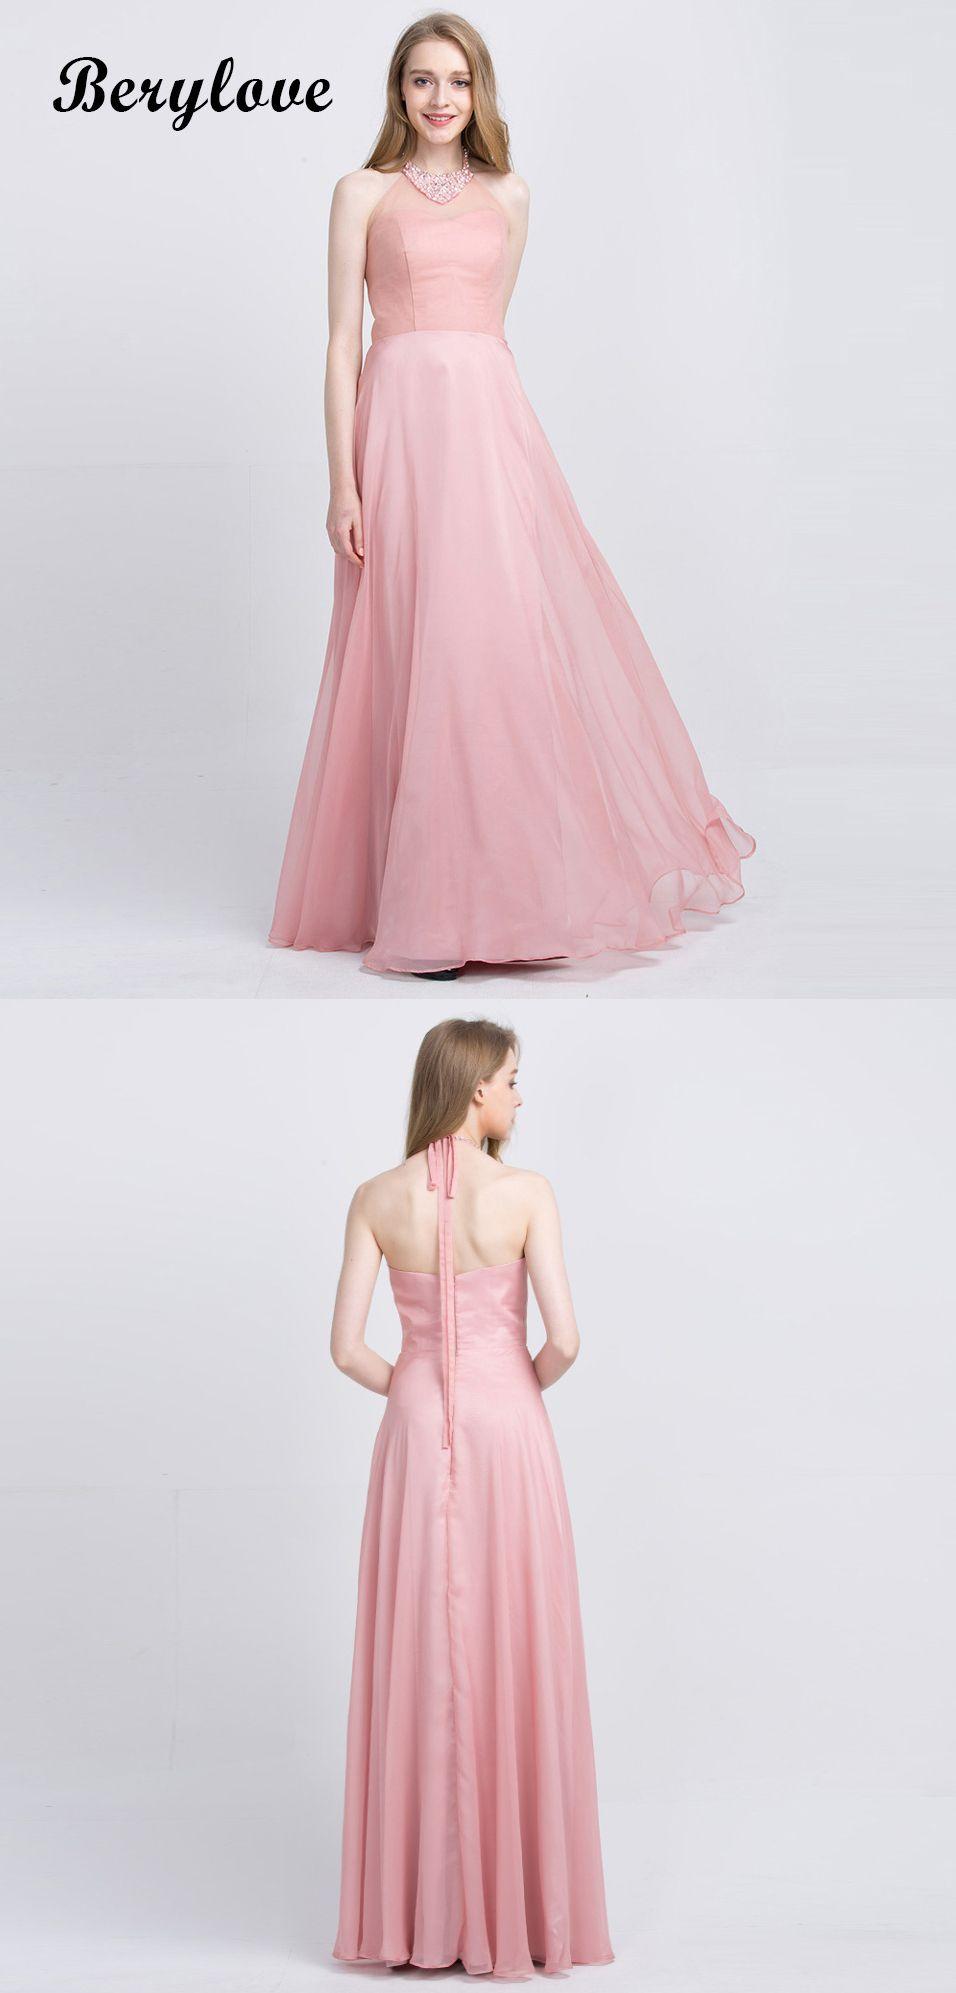 Beaded Halter Blush Pink Tulle Evening Dresses 2018 Halter promdresses  prom2018 eveningdresses promgowns eveninggowns formaldresses halterpromdresses   ... f4f5ff12370c